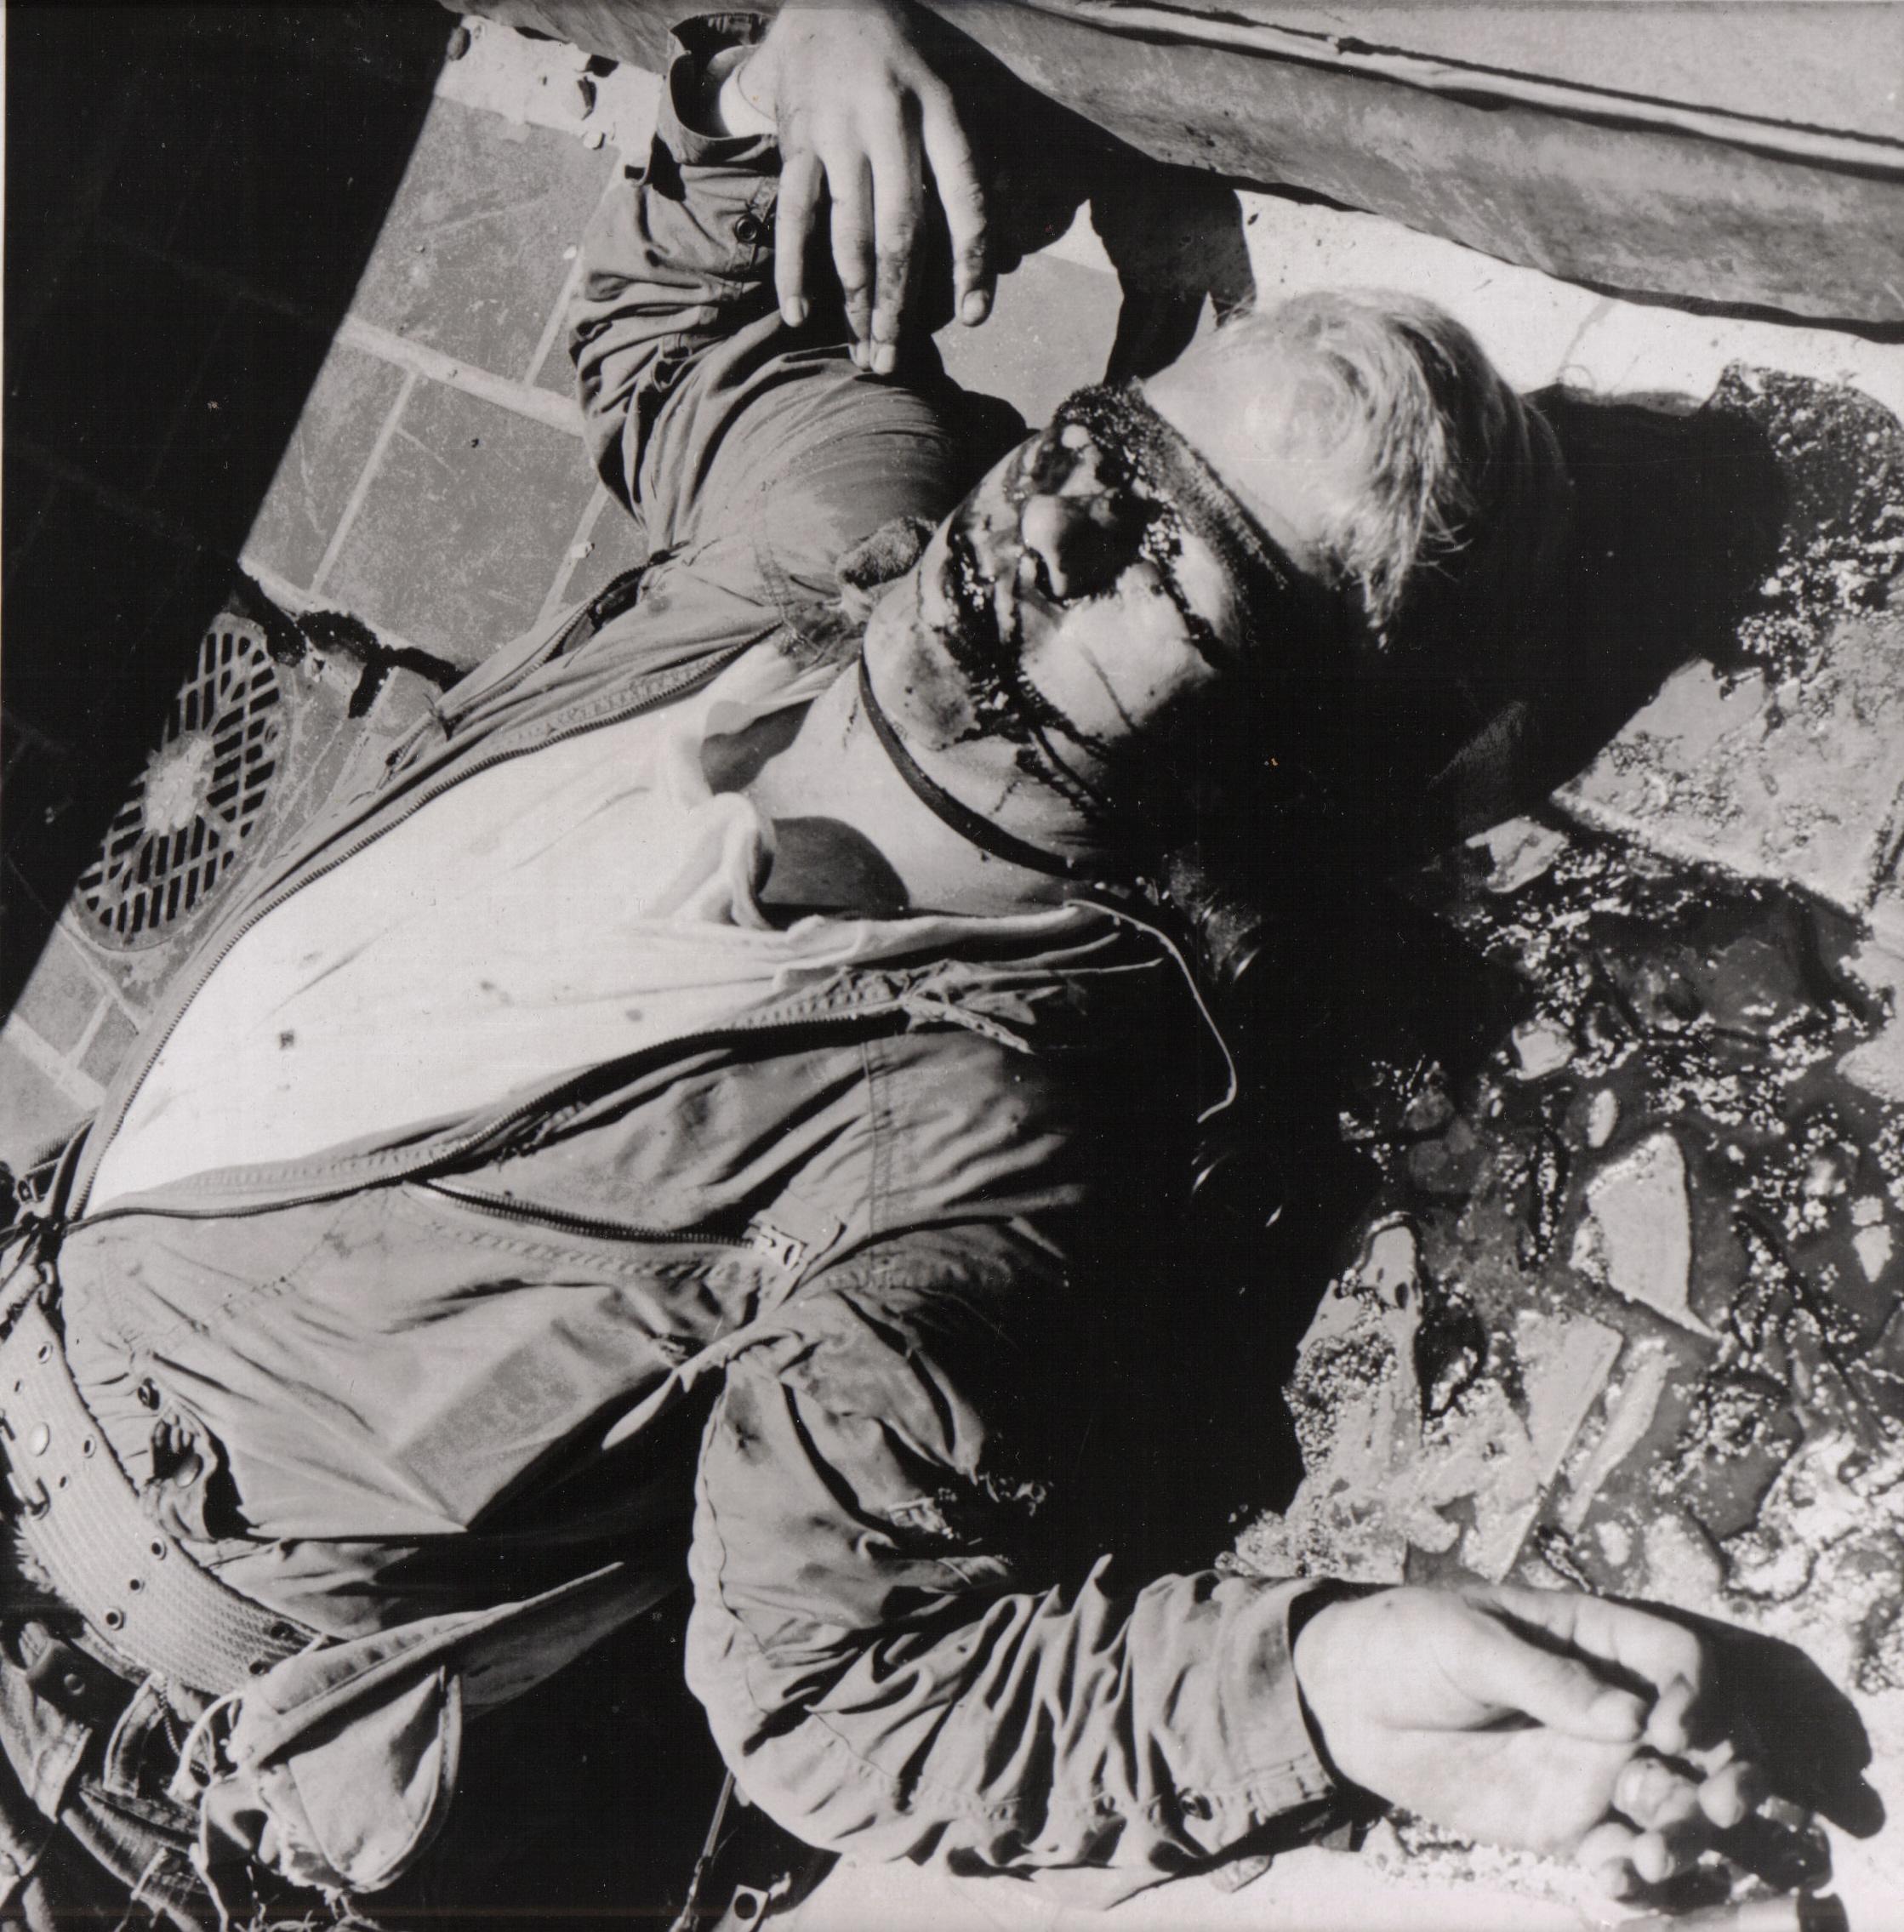 https://upload.wikimedia.org/wikipedia/commons/0/0d/Body_of_Charles_Whitman.jpg